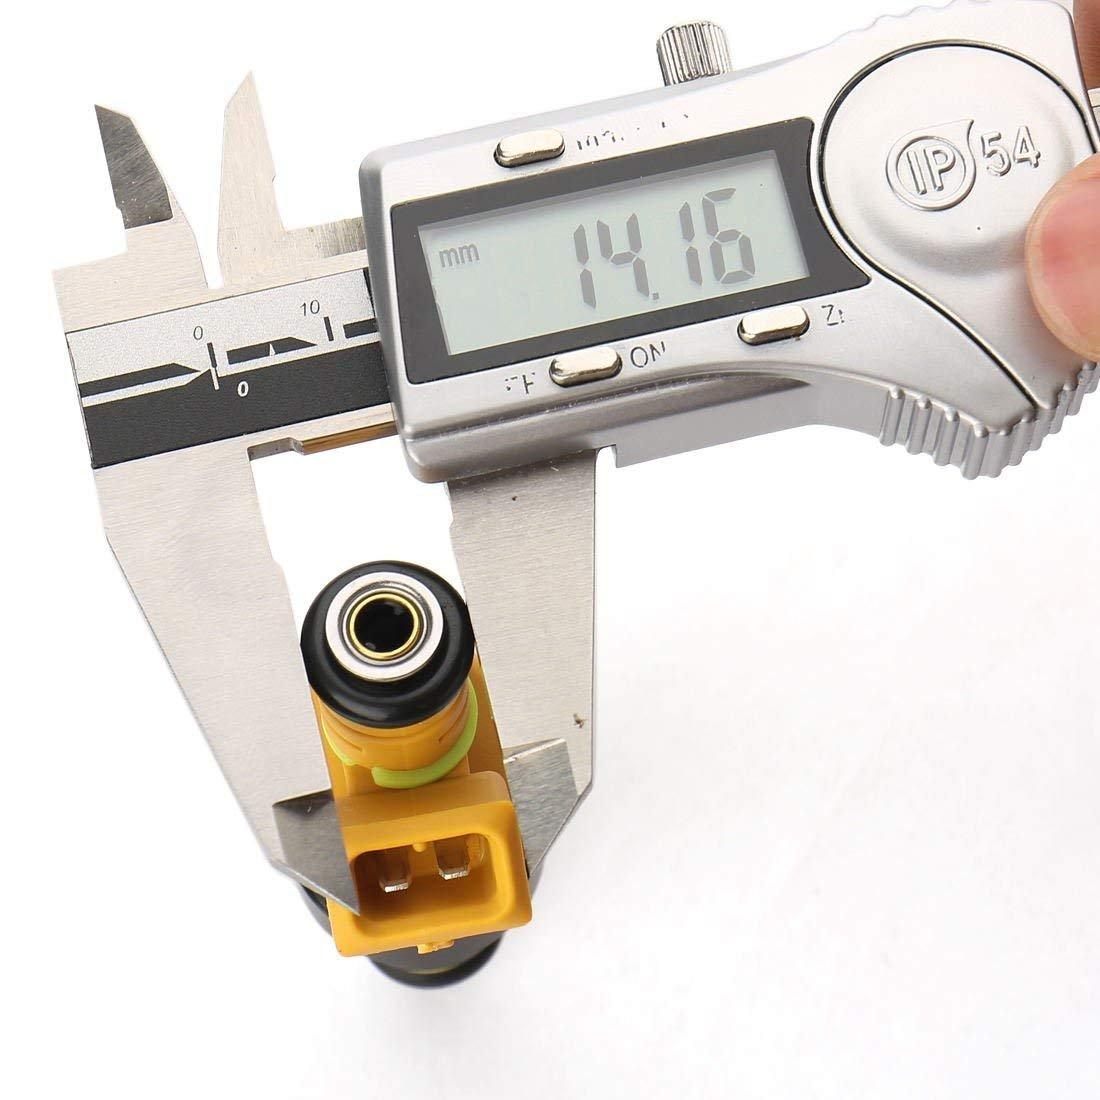 Flow Matched Fuel Injectors Set Of 8 For Ford F150 F250 Filter 2007 Truck F350 E150 E250 E350 E450 Mustang Excursion 46l 50l 54l 58l V8 0280150943 Automotive